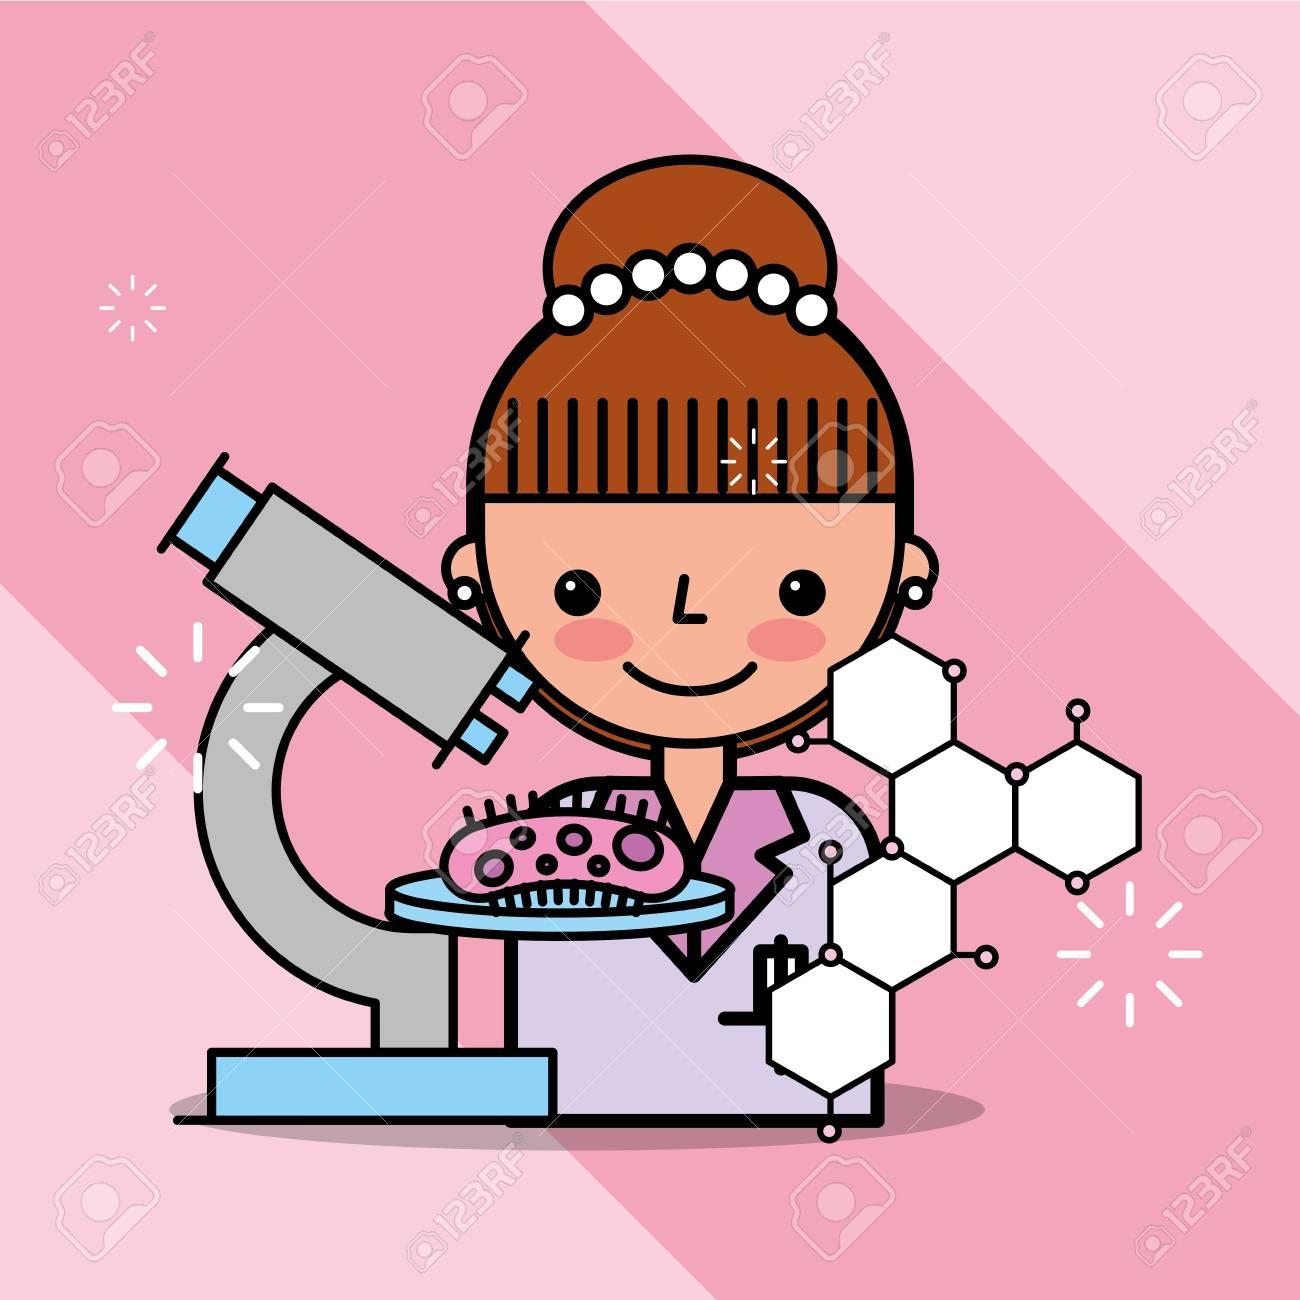 scientist woman cartoon analysismicroscope bacteria vector illustration royalty free cliparts vectors and stock illustration image 101047890 scientist woman cartoon analysismicroscope bacteria vector illustration